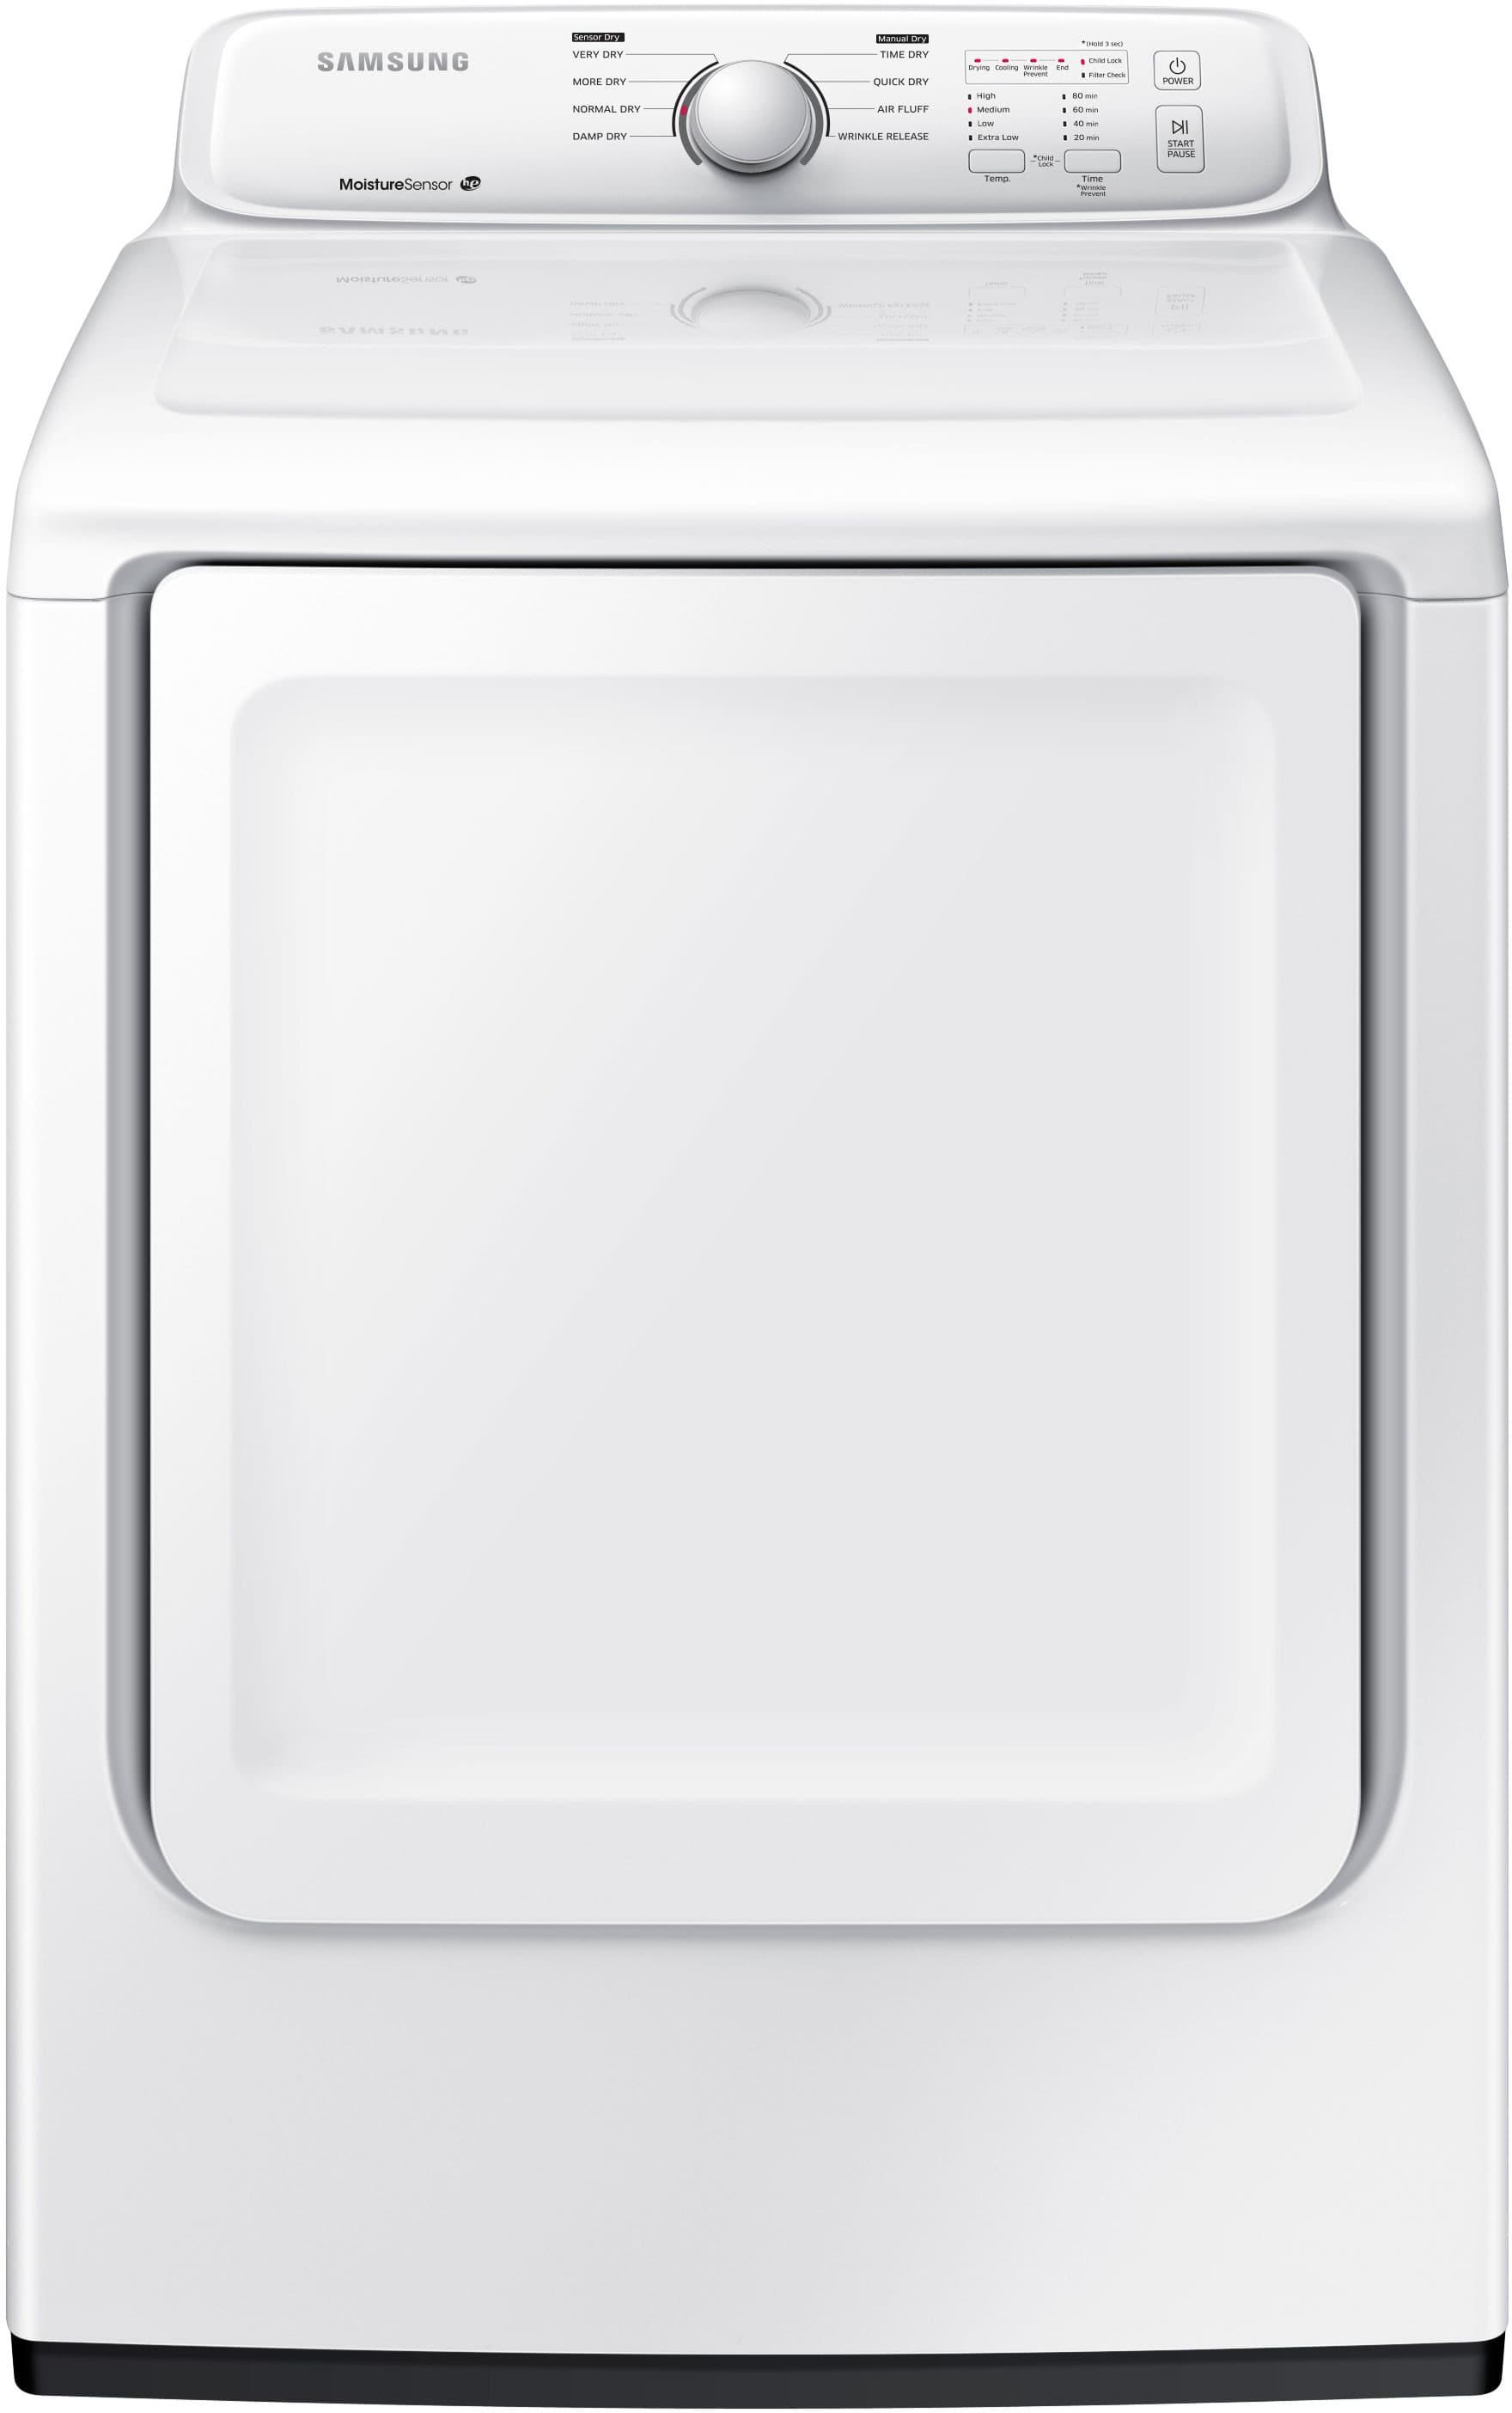 Samsung Dv40j3000ew 27 Inch 72 Cu Ft Electric Dryer With 8 Dry